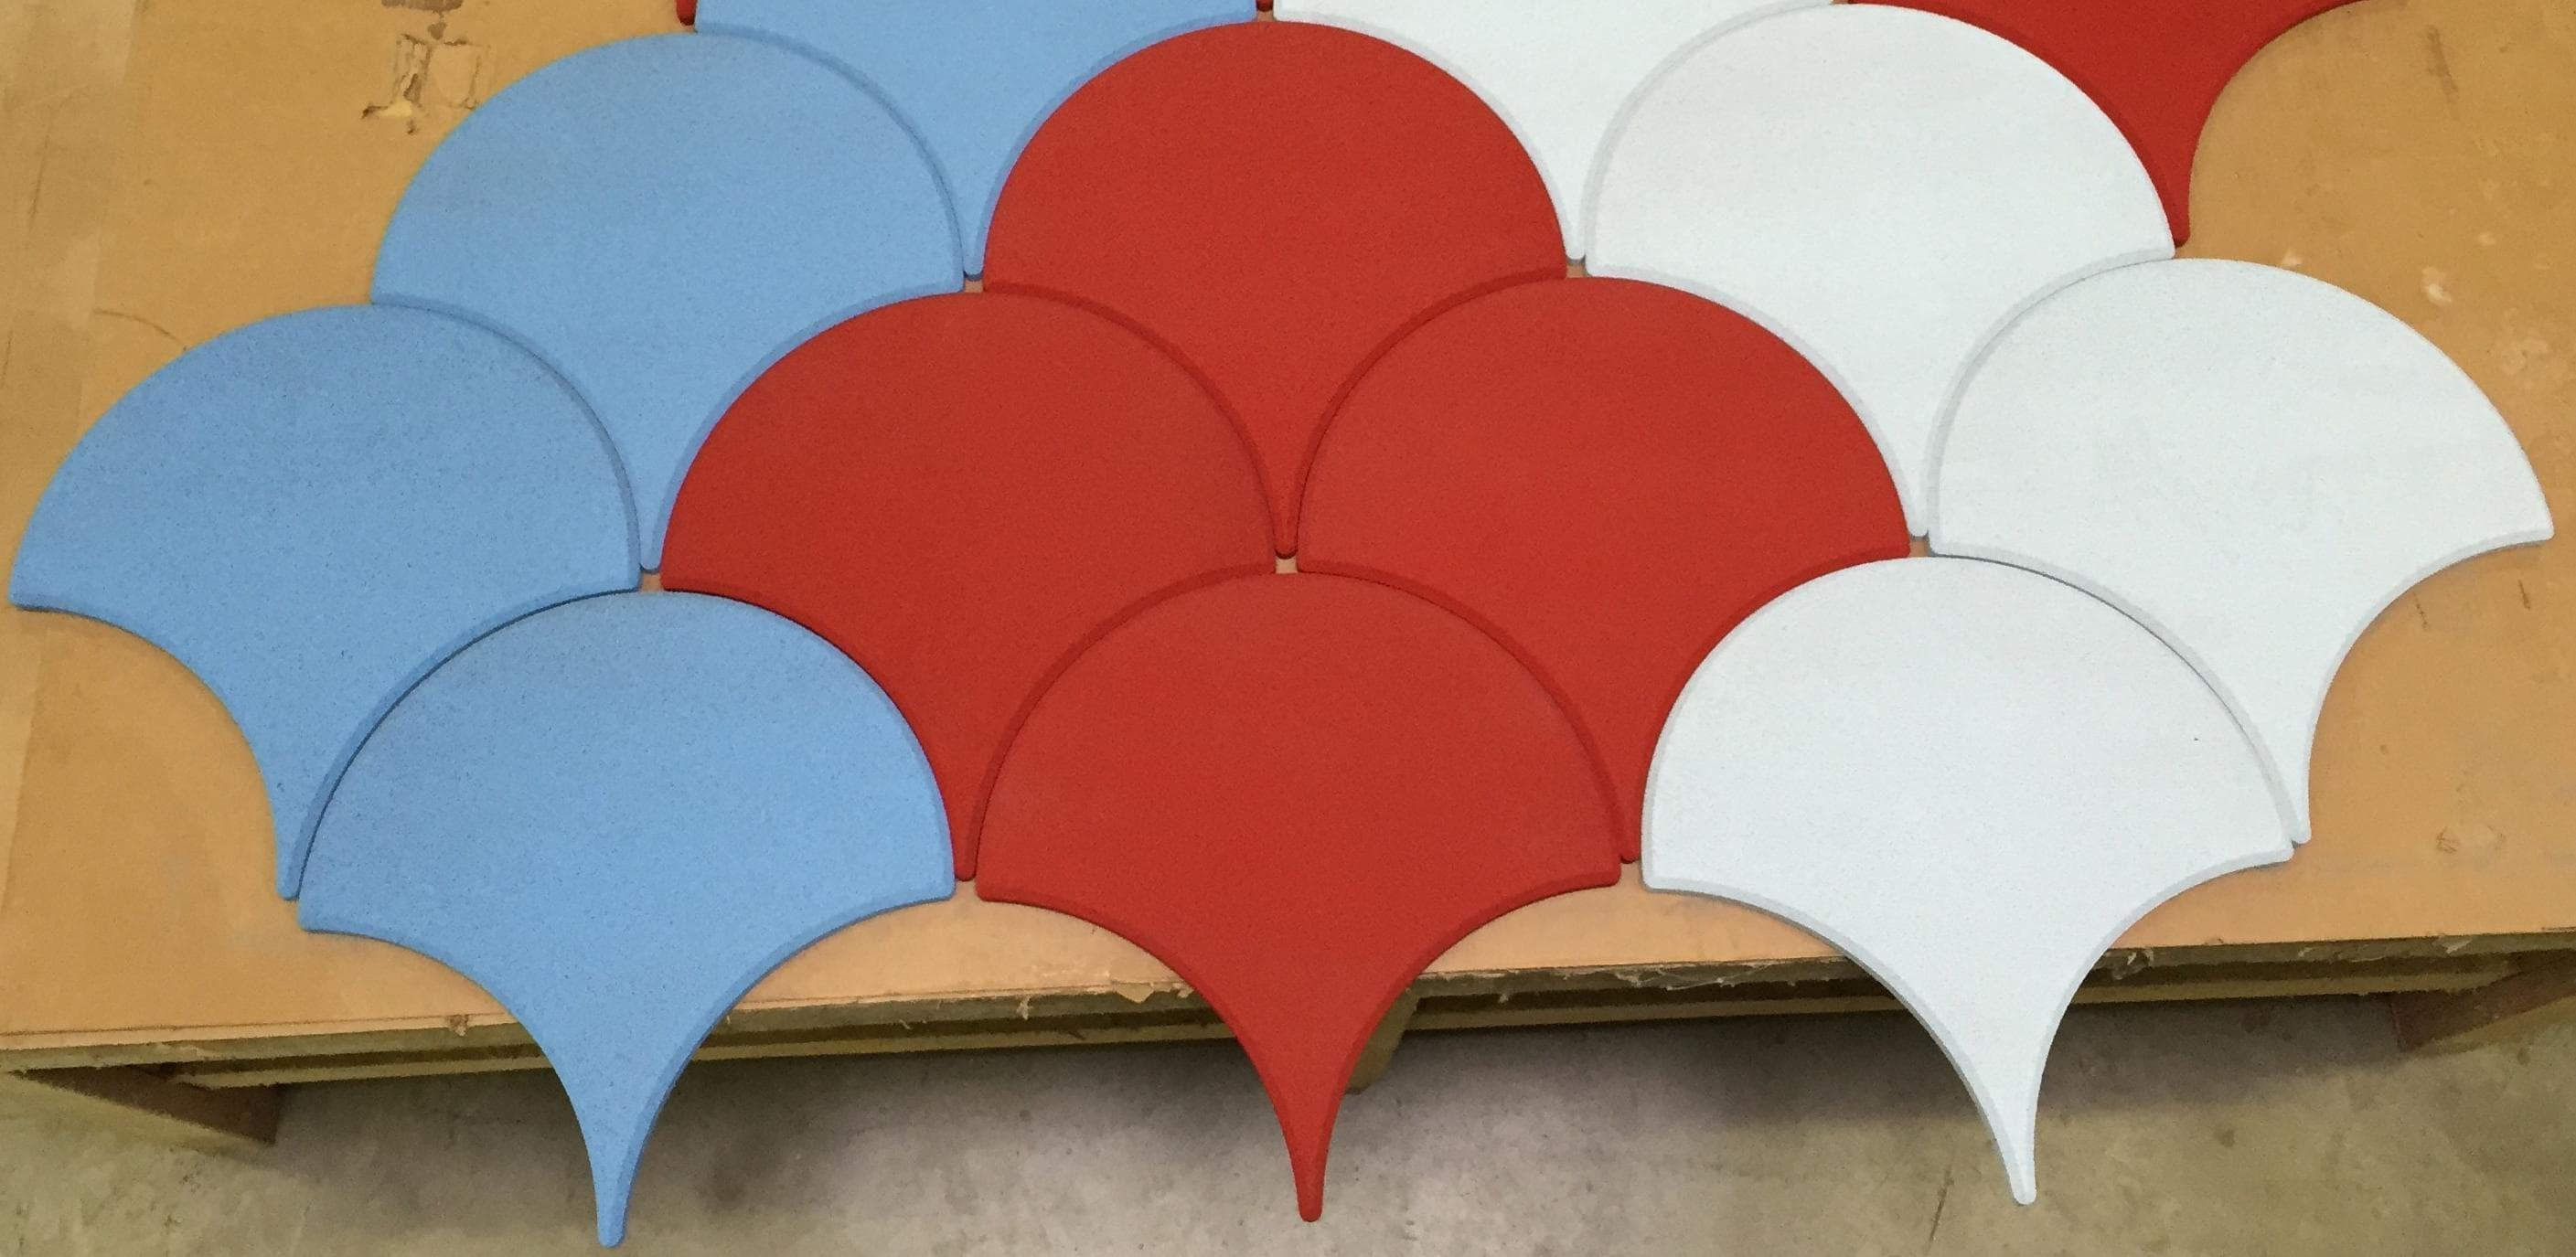 Silent shape. Custom cut shapes.